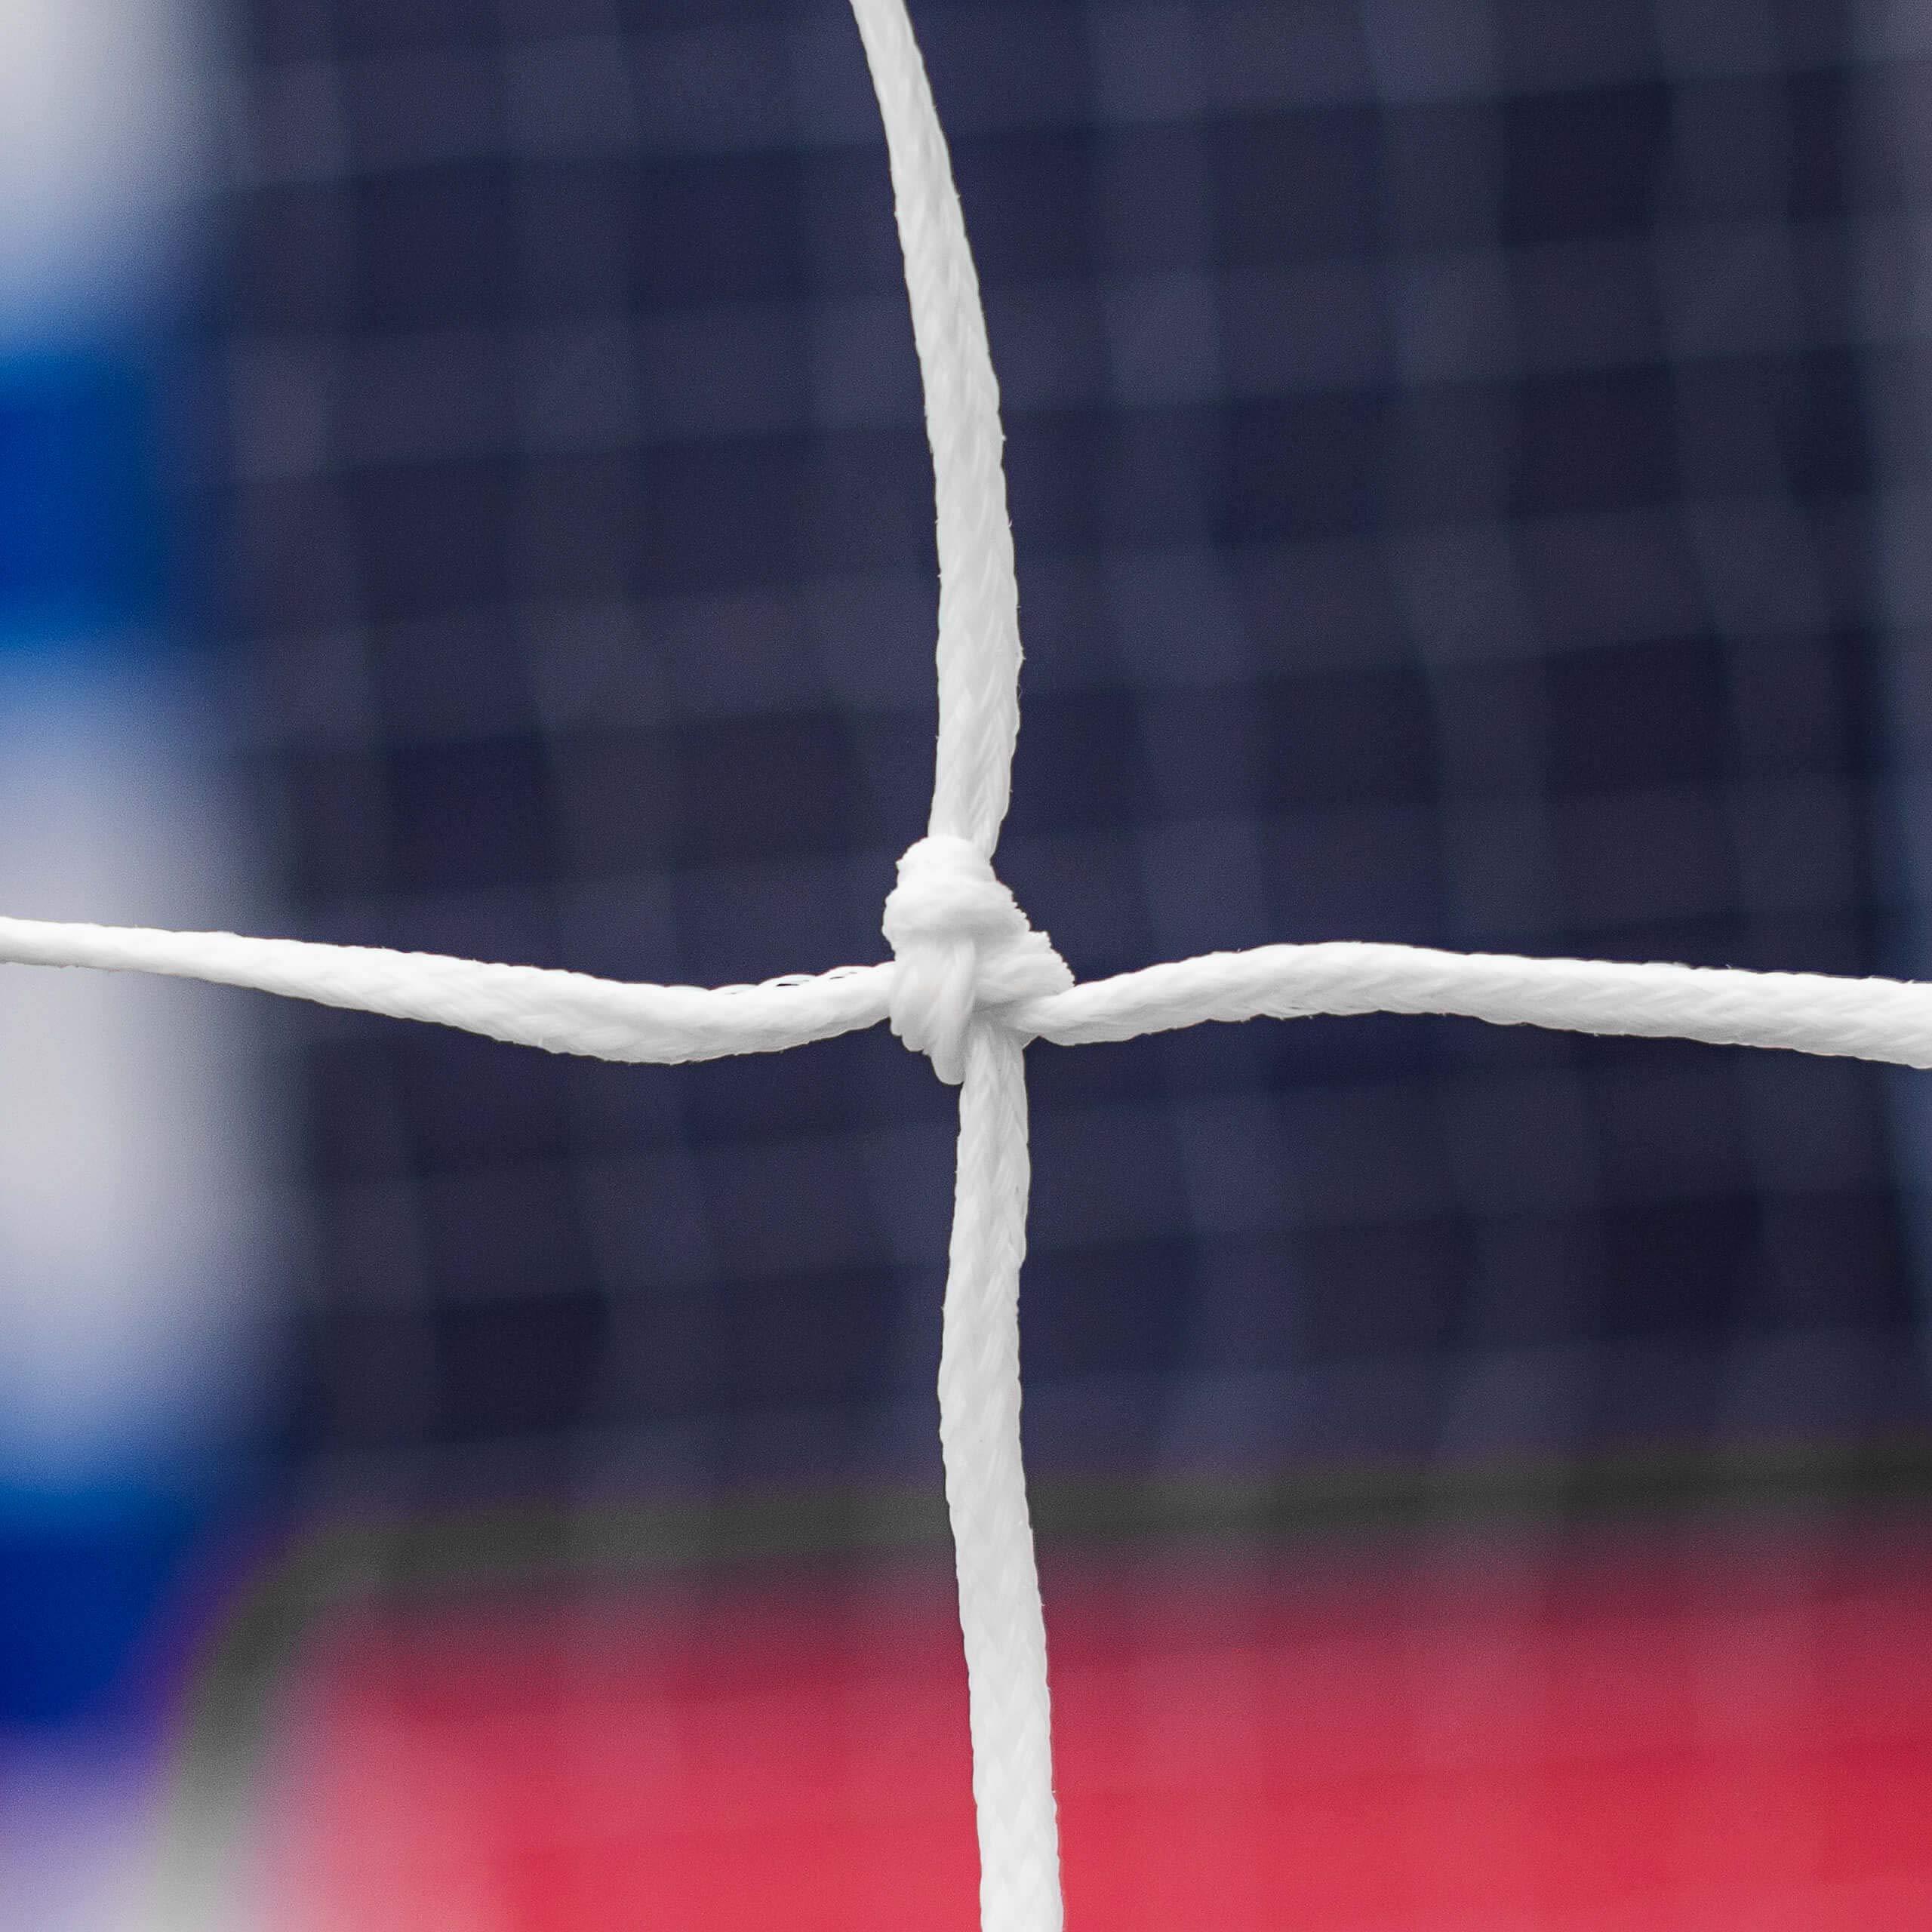 Forza Alu80 Competition Handball Goals | IHF Regulation Size 3m x 2m Handball Goal [Net World Sports] (Pair, Red) by Forza (Image #8)